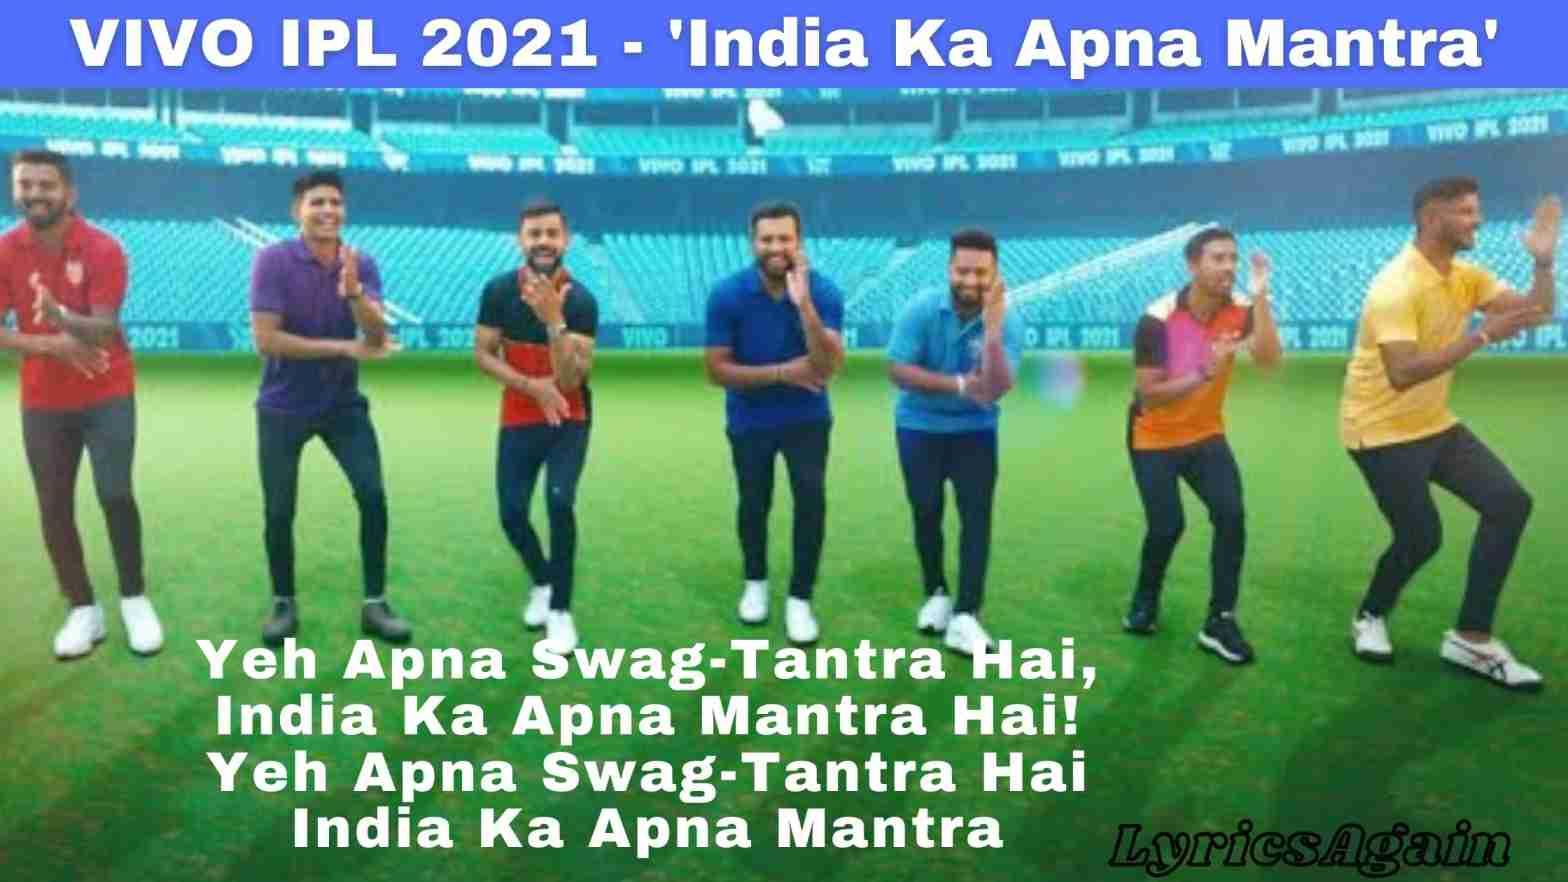 India Ka Apna Mantra lyrics - VIVO IPL 2021 Song